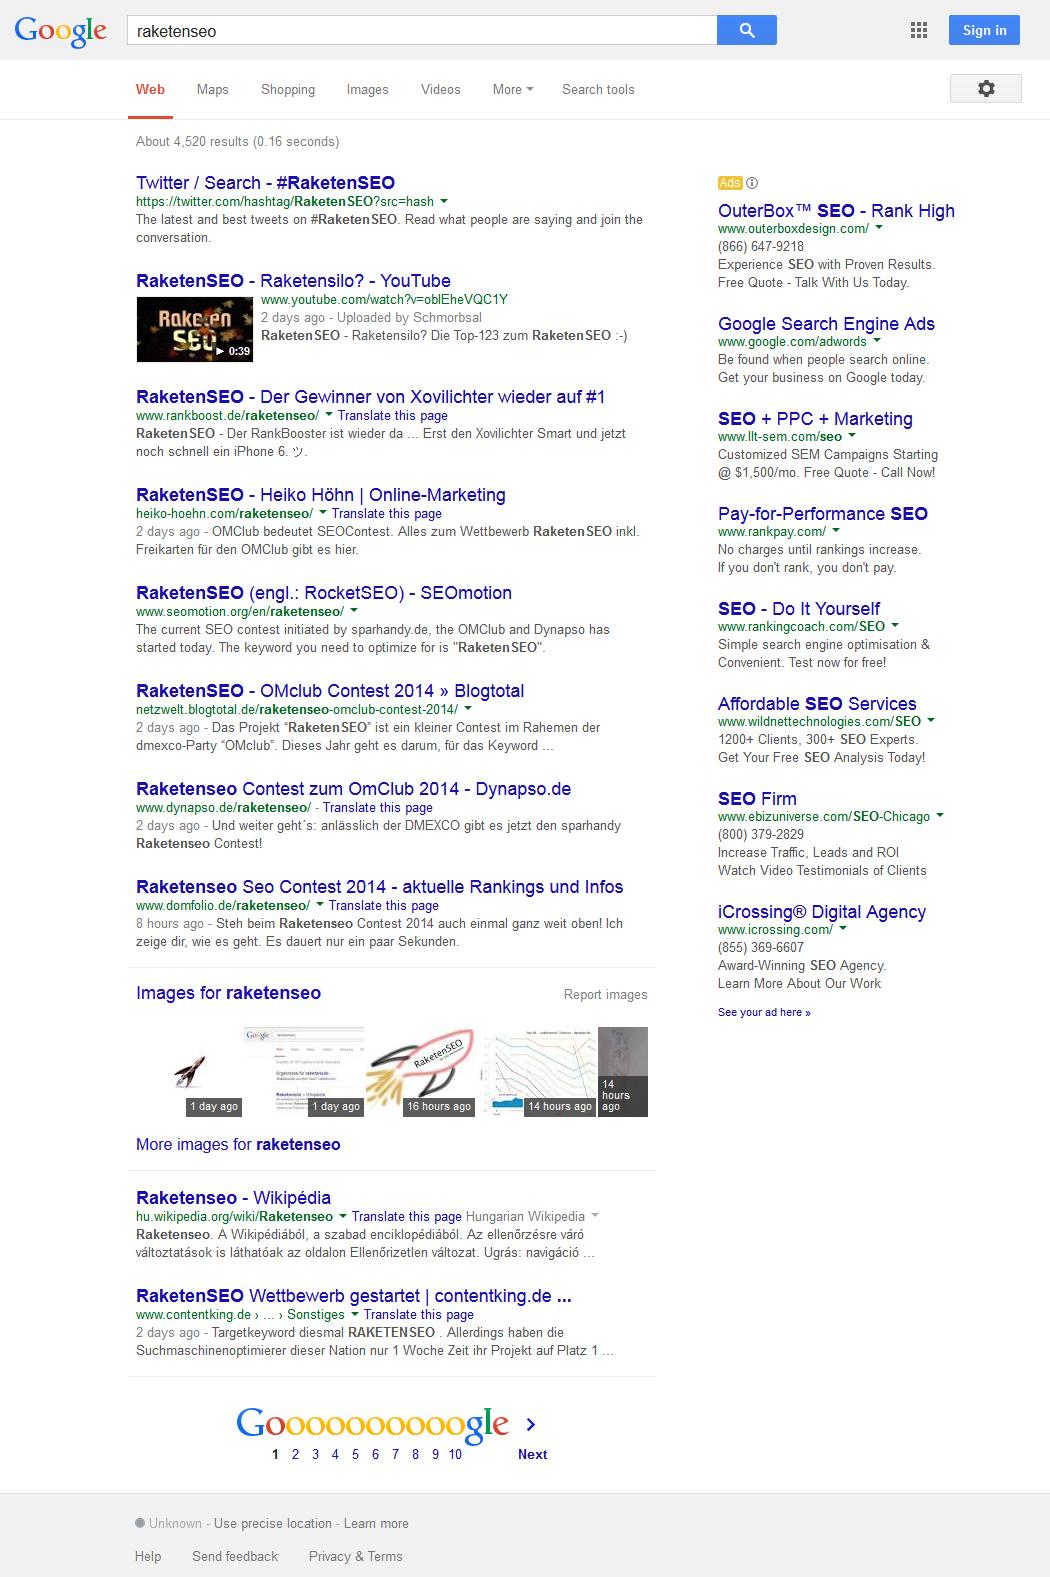 Raketenseo bei google.com (USA)